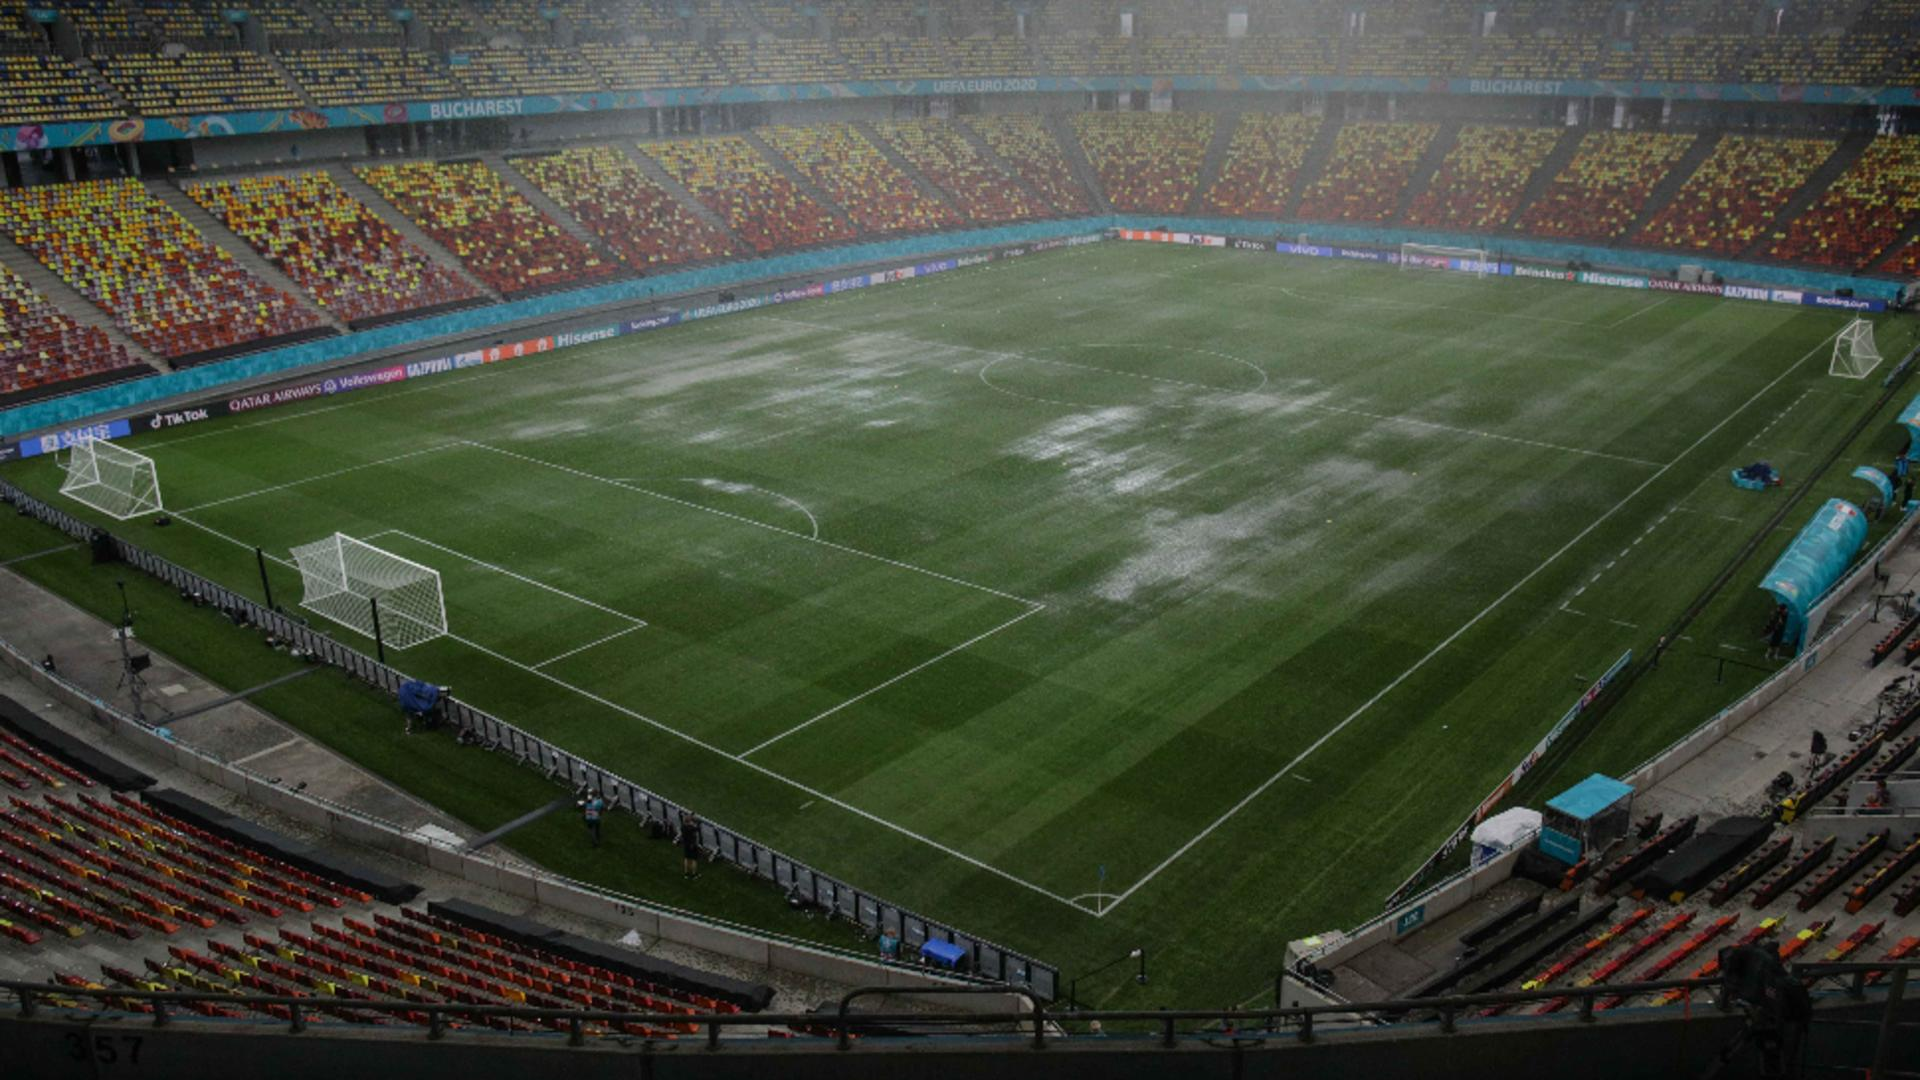 Arena Națională  - FOTO INQUAM (Octav Ganea)